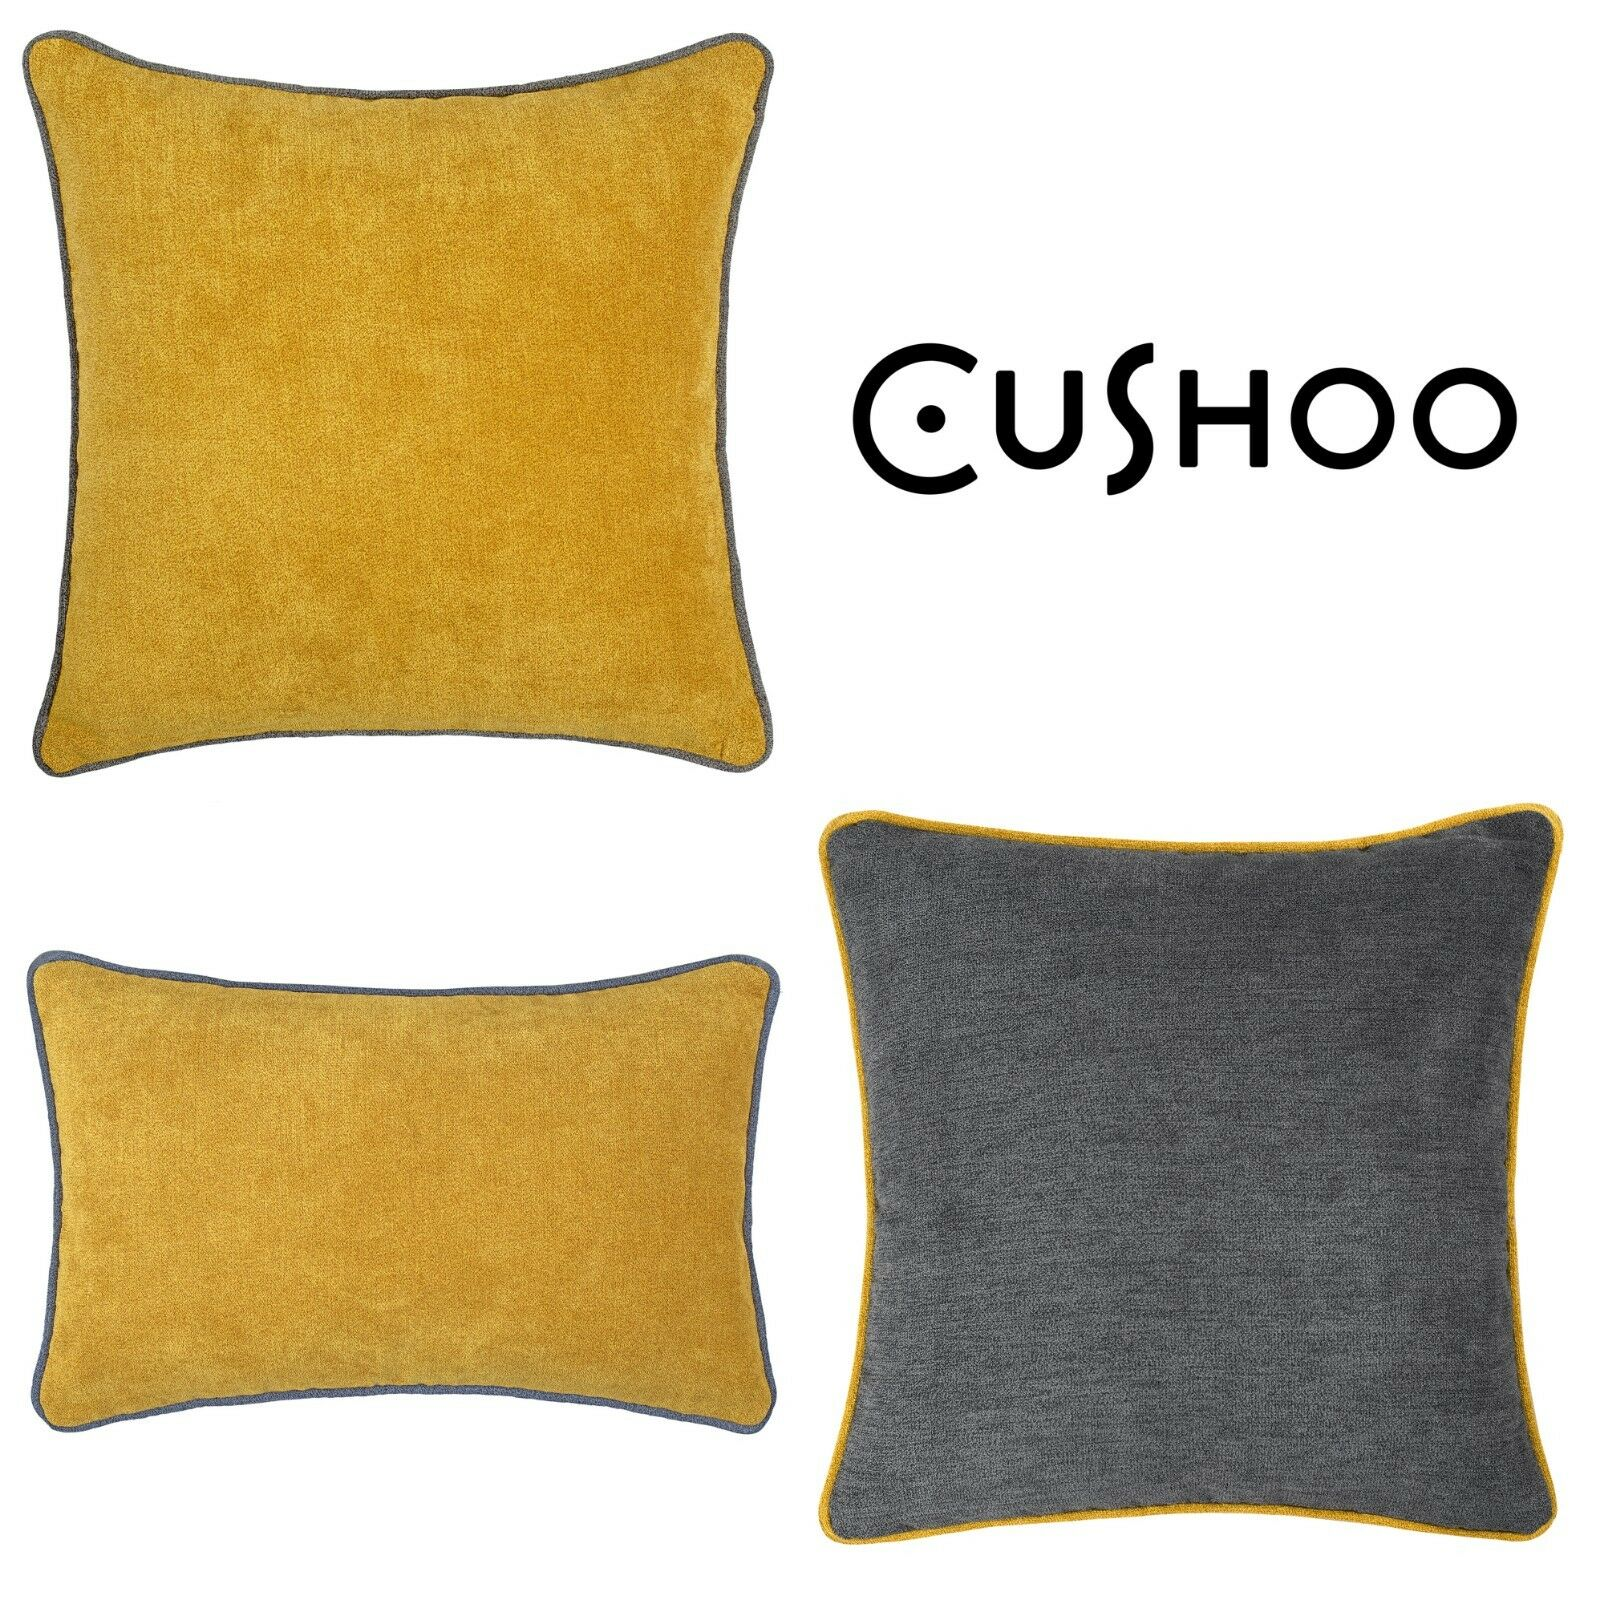 Mustard Yellow Cushion Dark Grey Piping Oblong Sofa Throw To